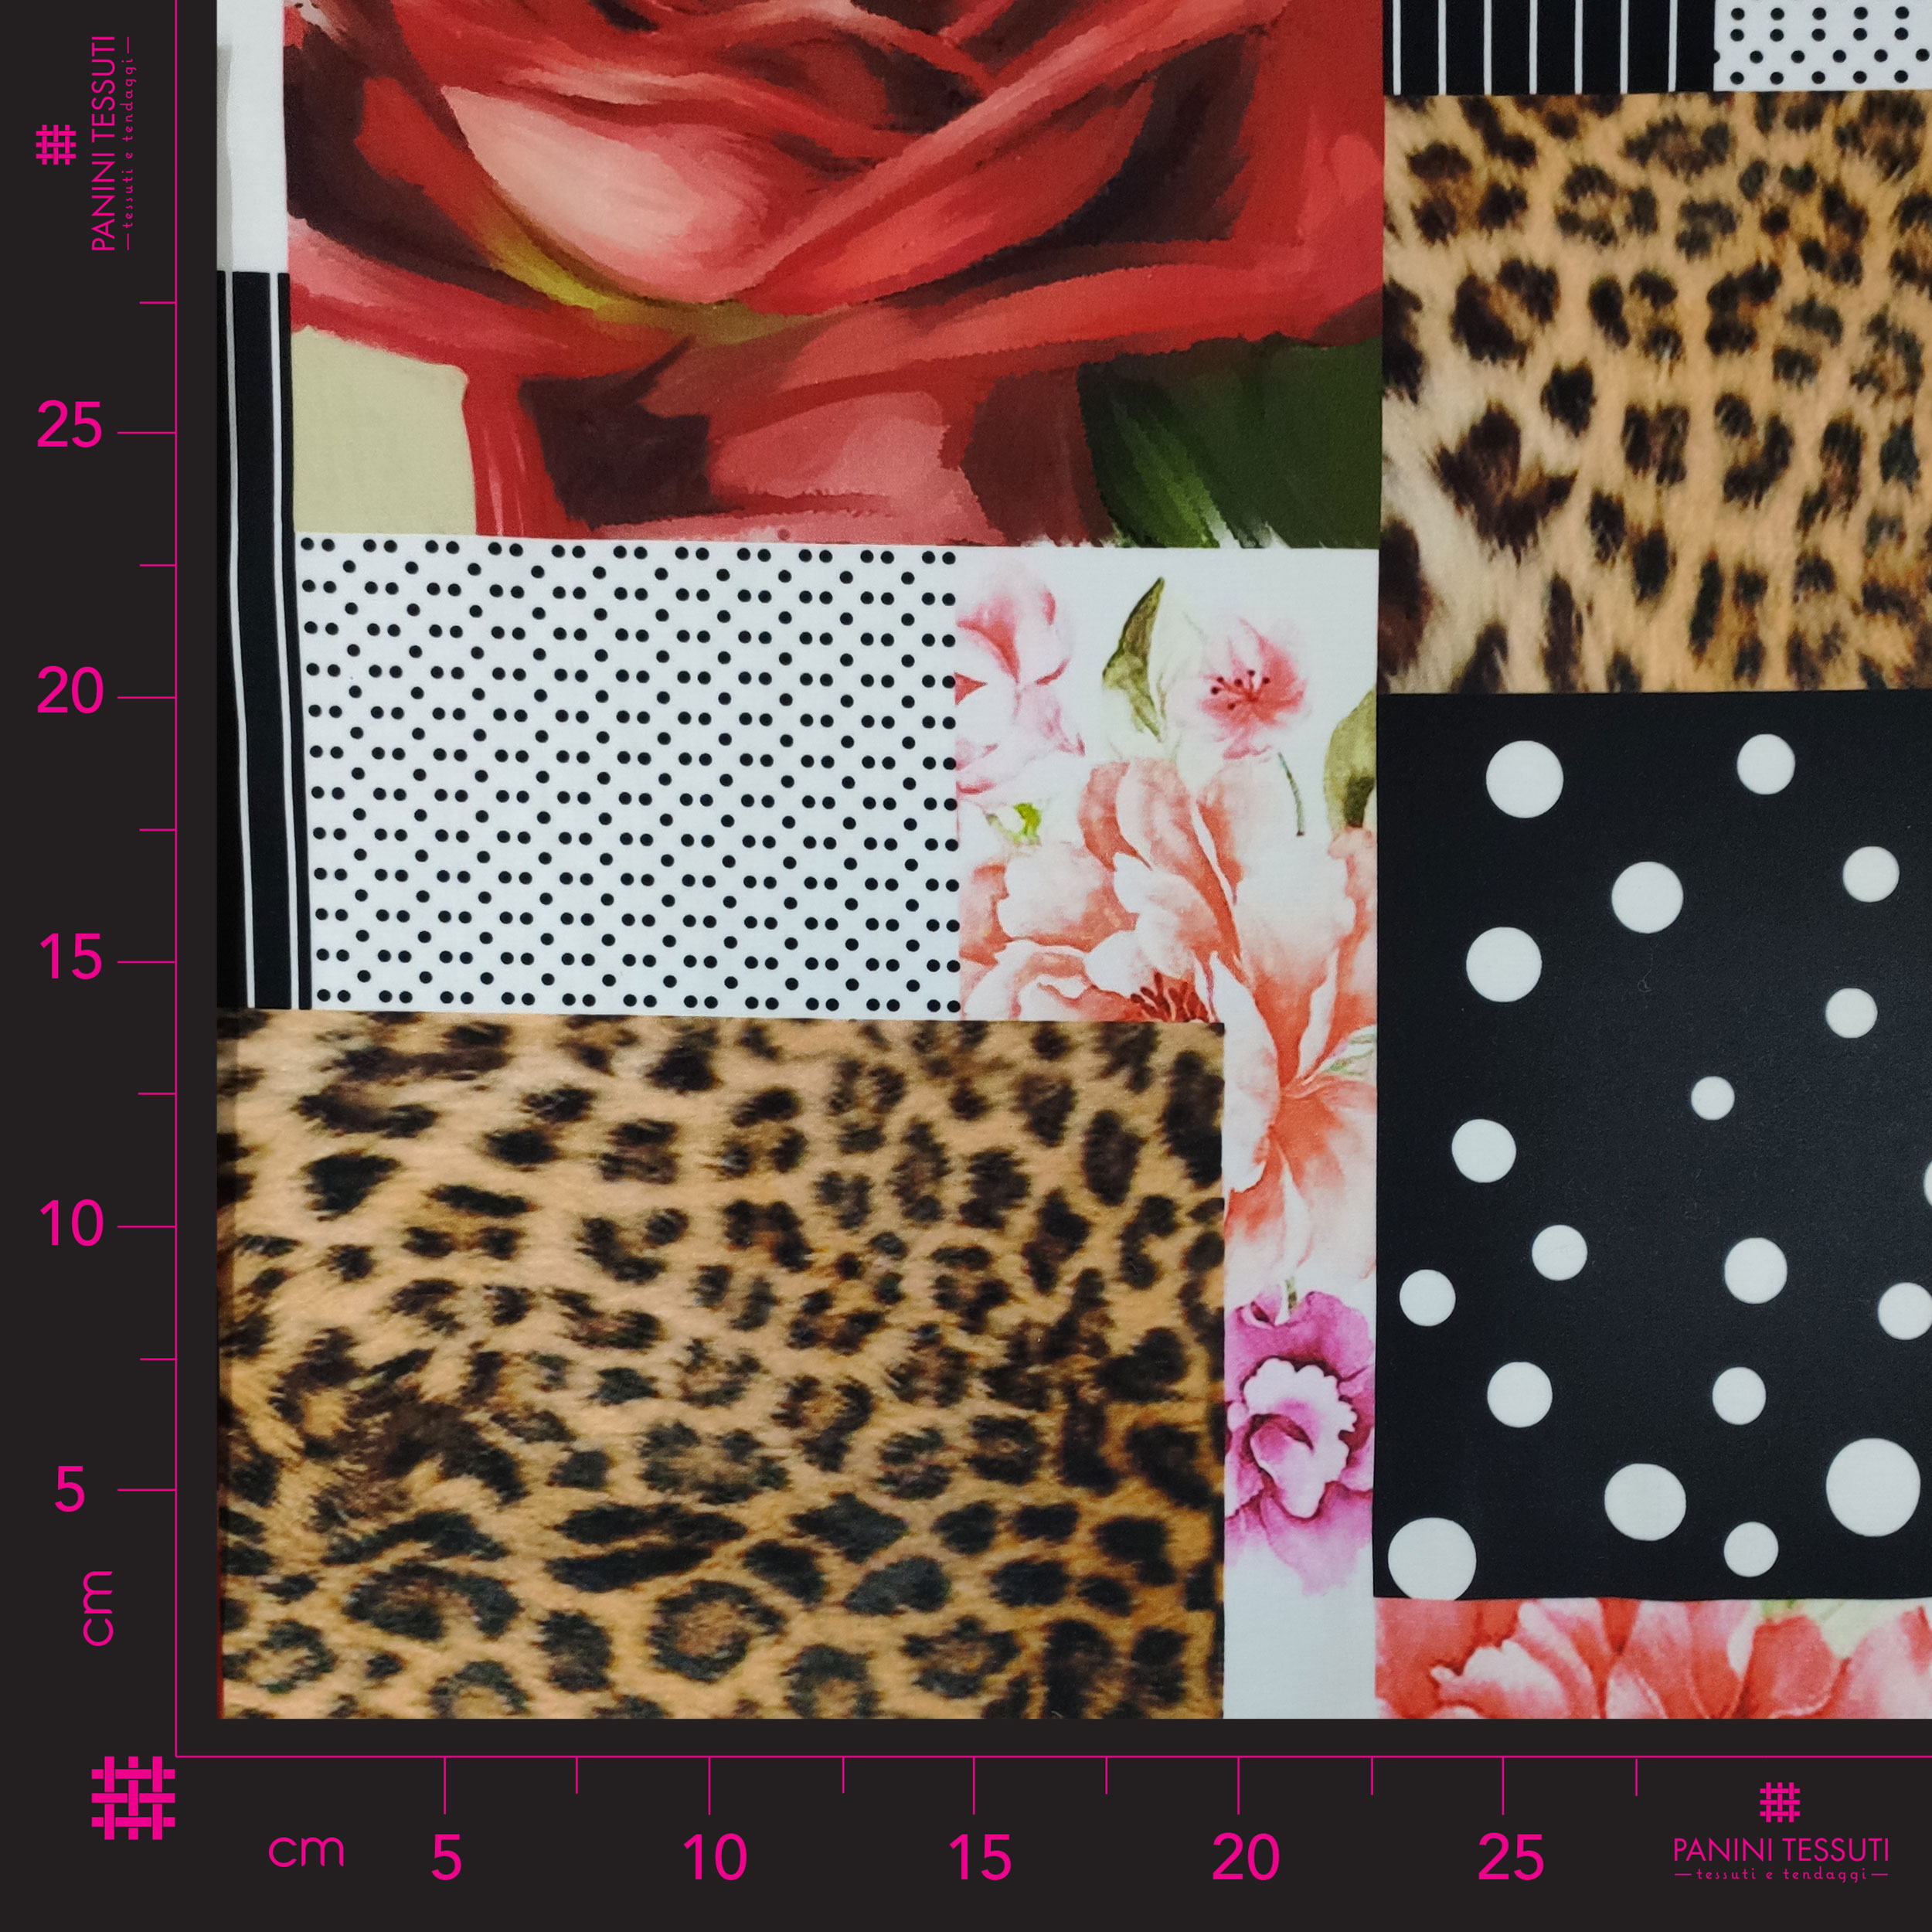 Tessuto di Cotone Alta Moda Fantasia Patchwork Floreale Leopardata